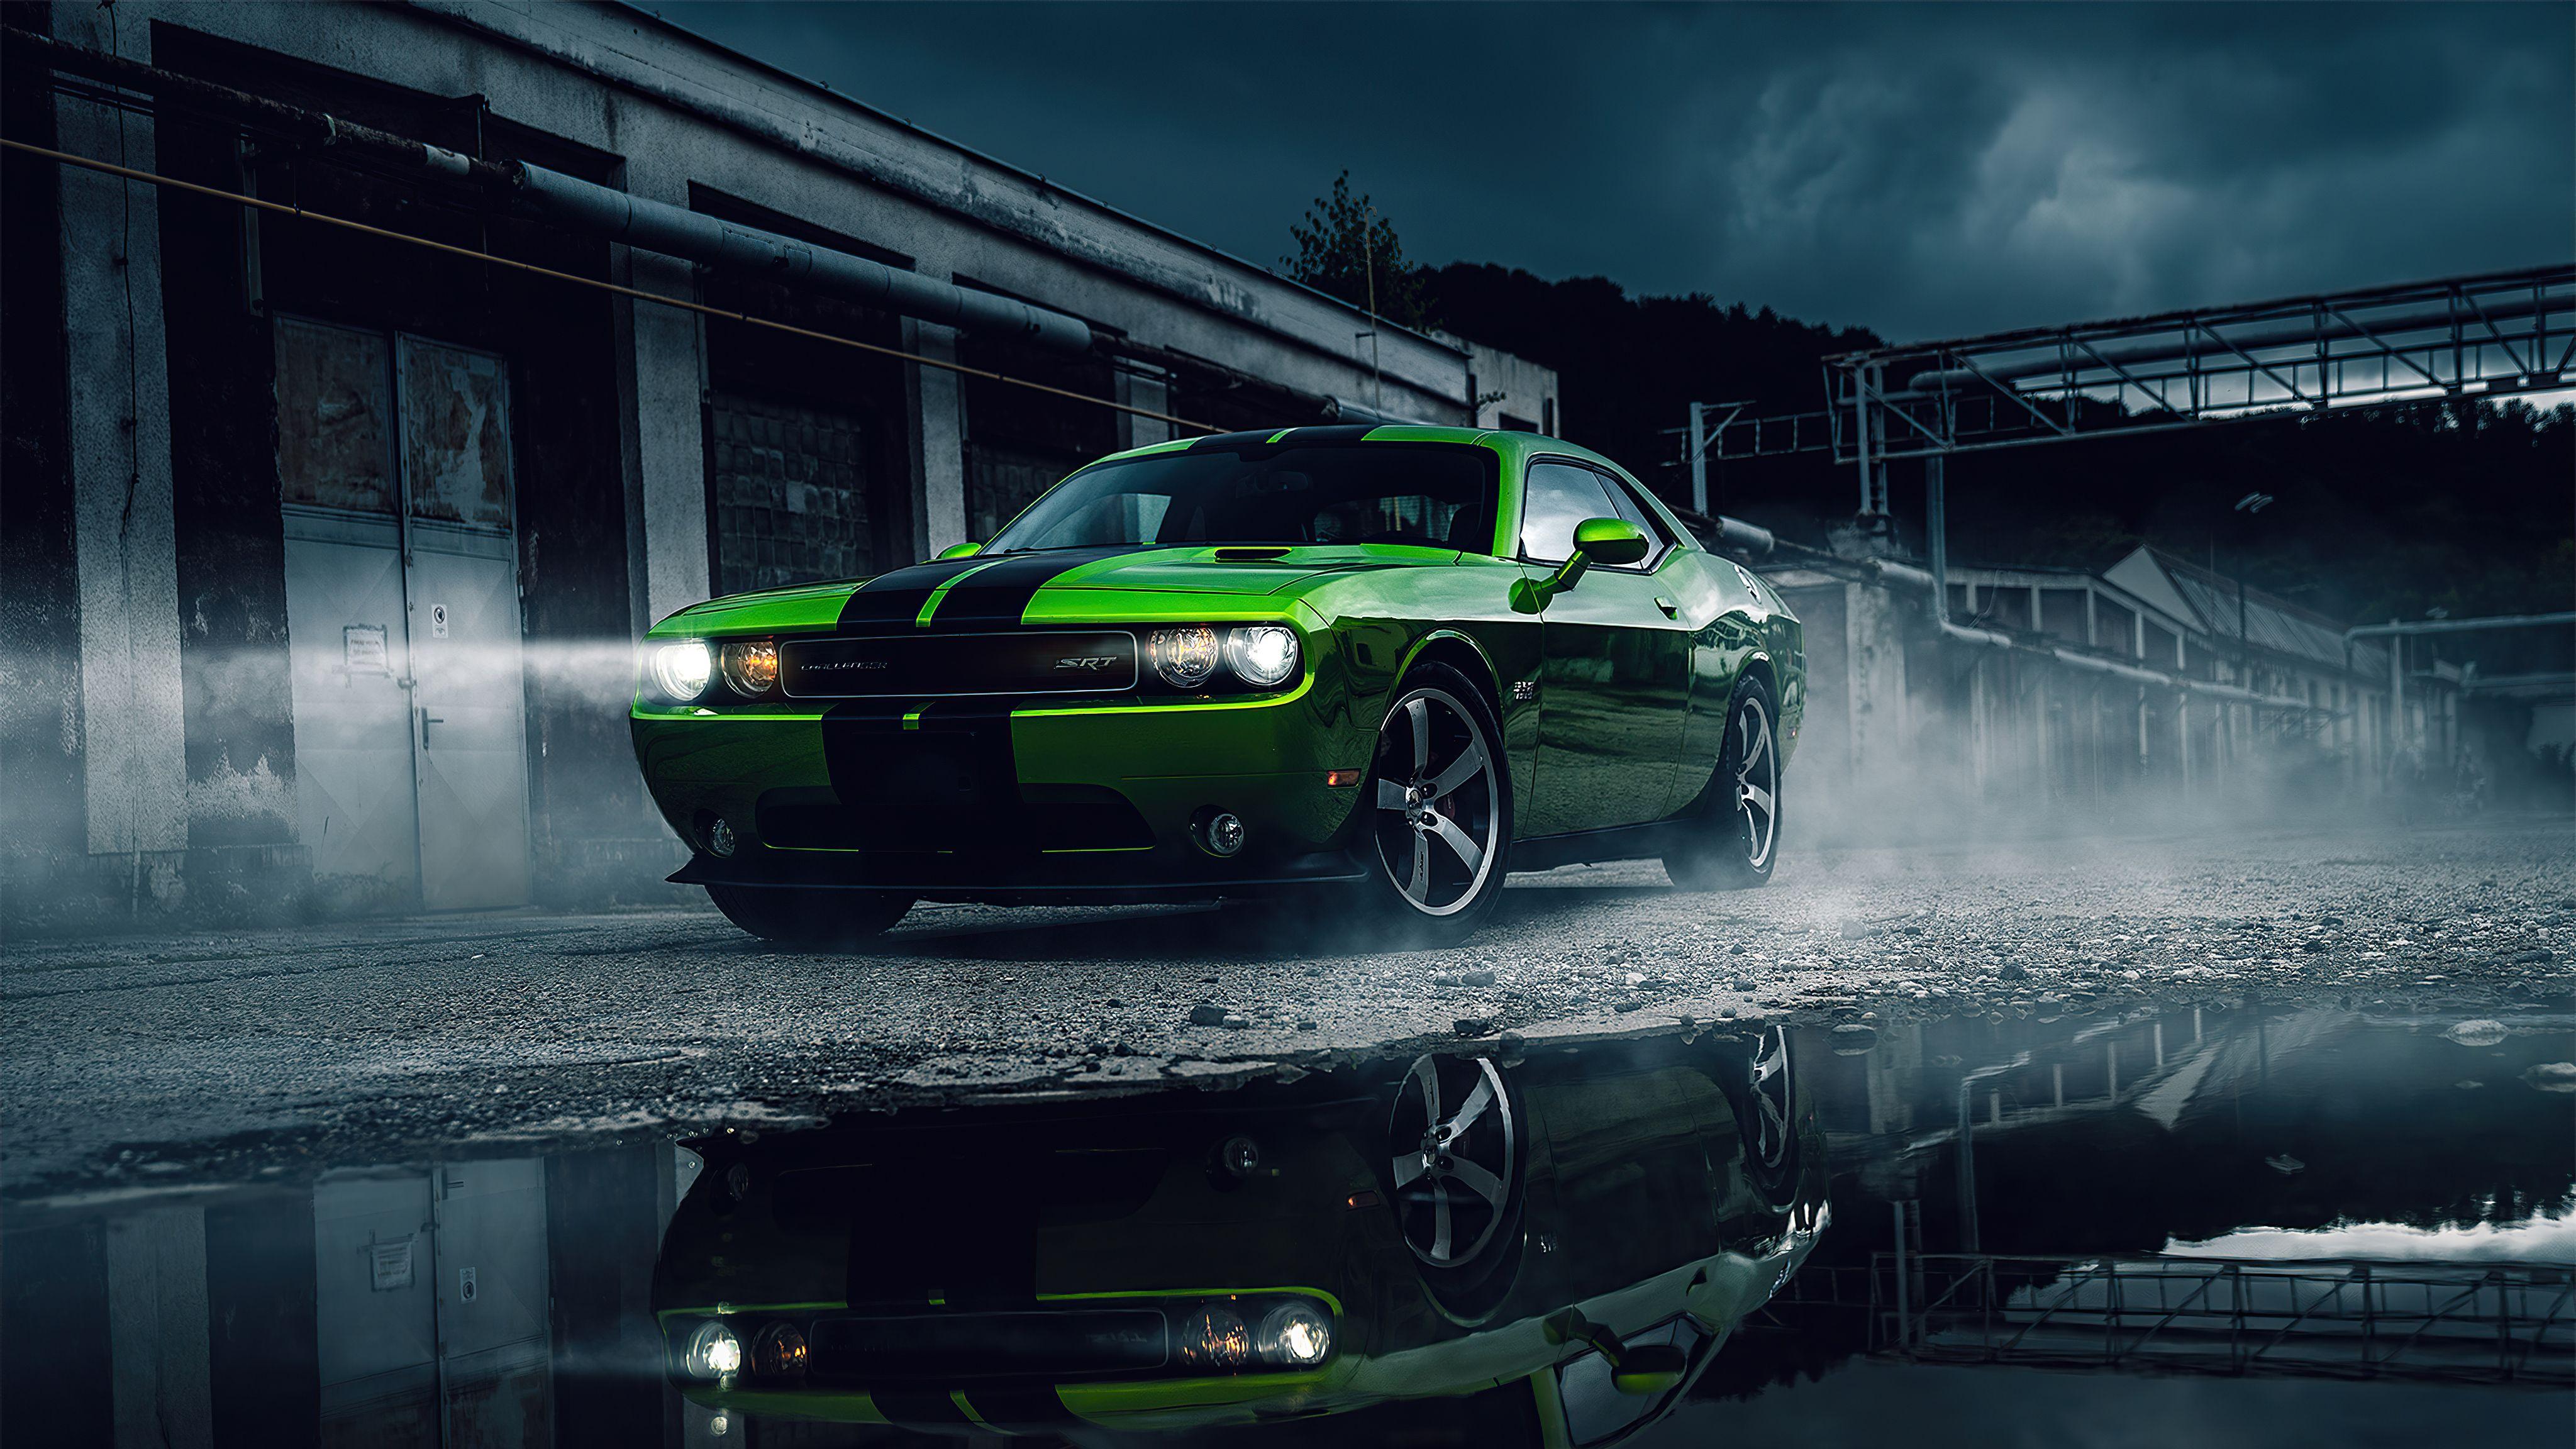 Green Dodge Challenger 4k Green Dodge Challenger 4k Wallpapers In 2021 Dodge Challenger Challenger Dodge